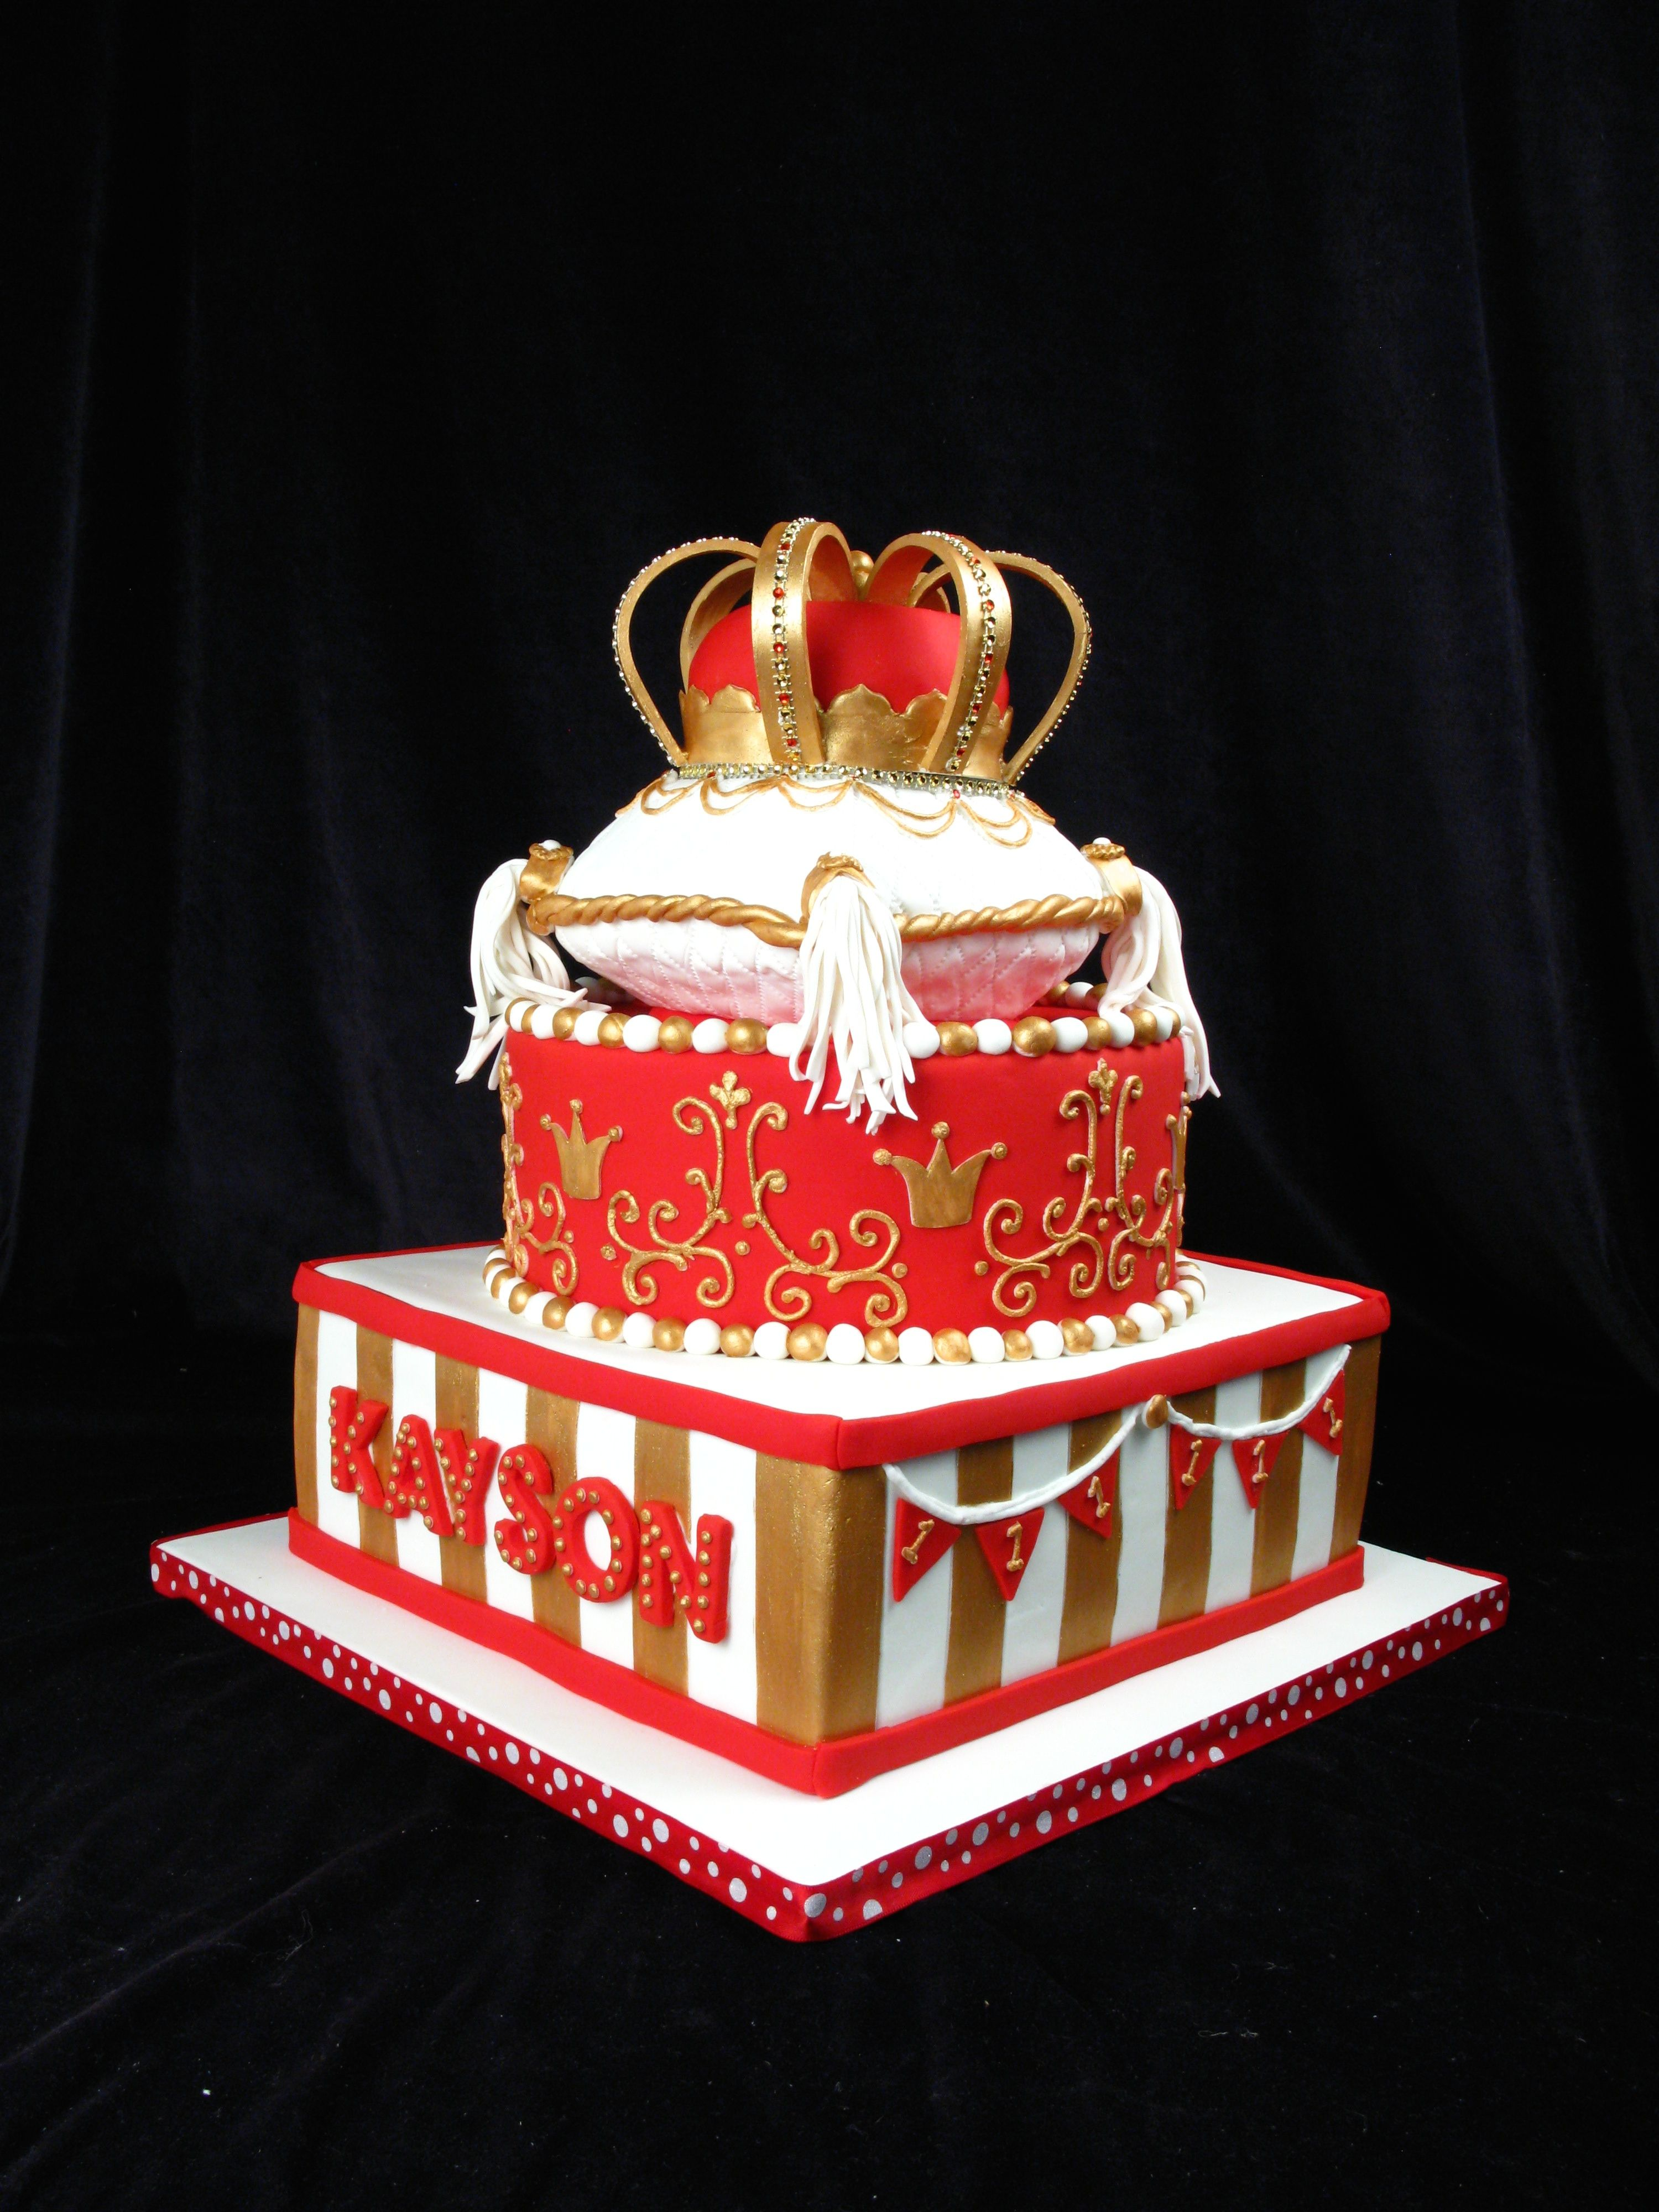 Royal cake red and gold cake crown cake carnival theme king cake